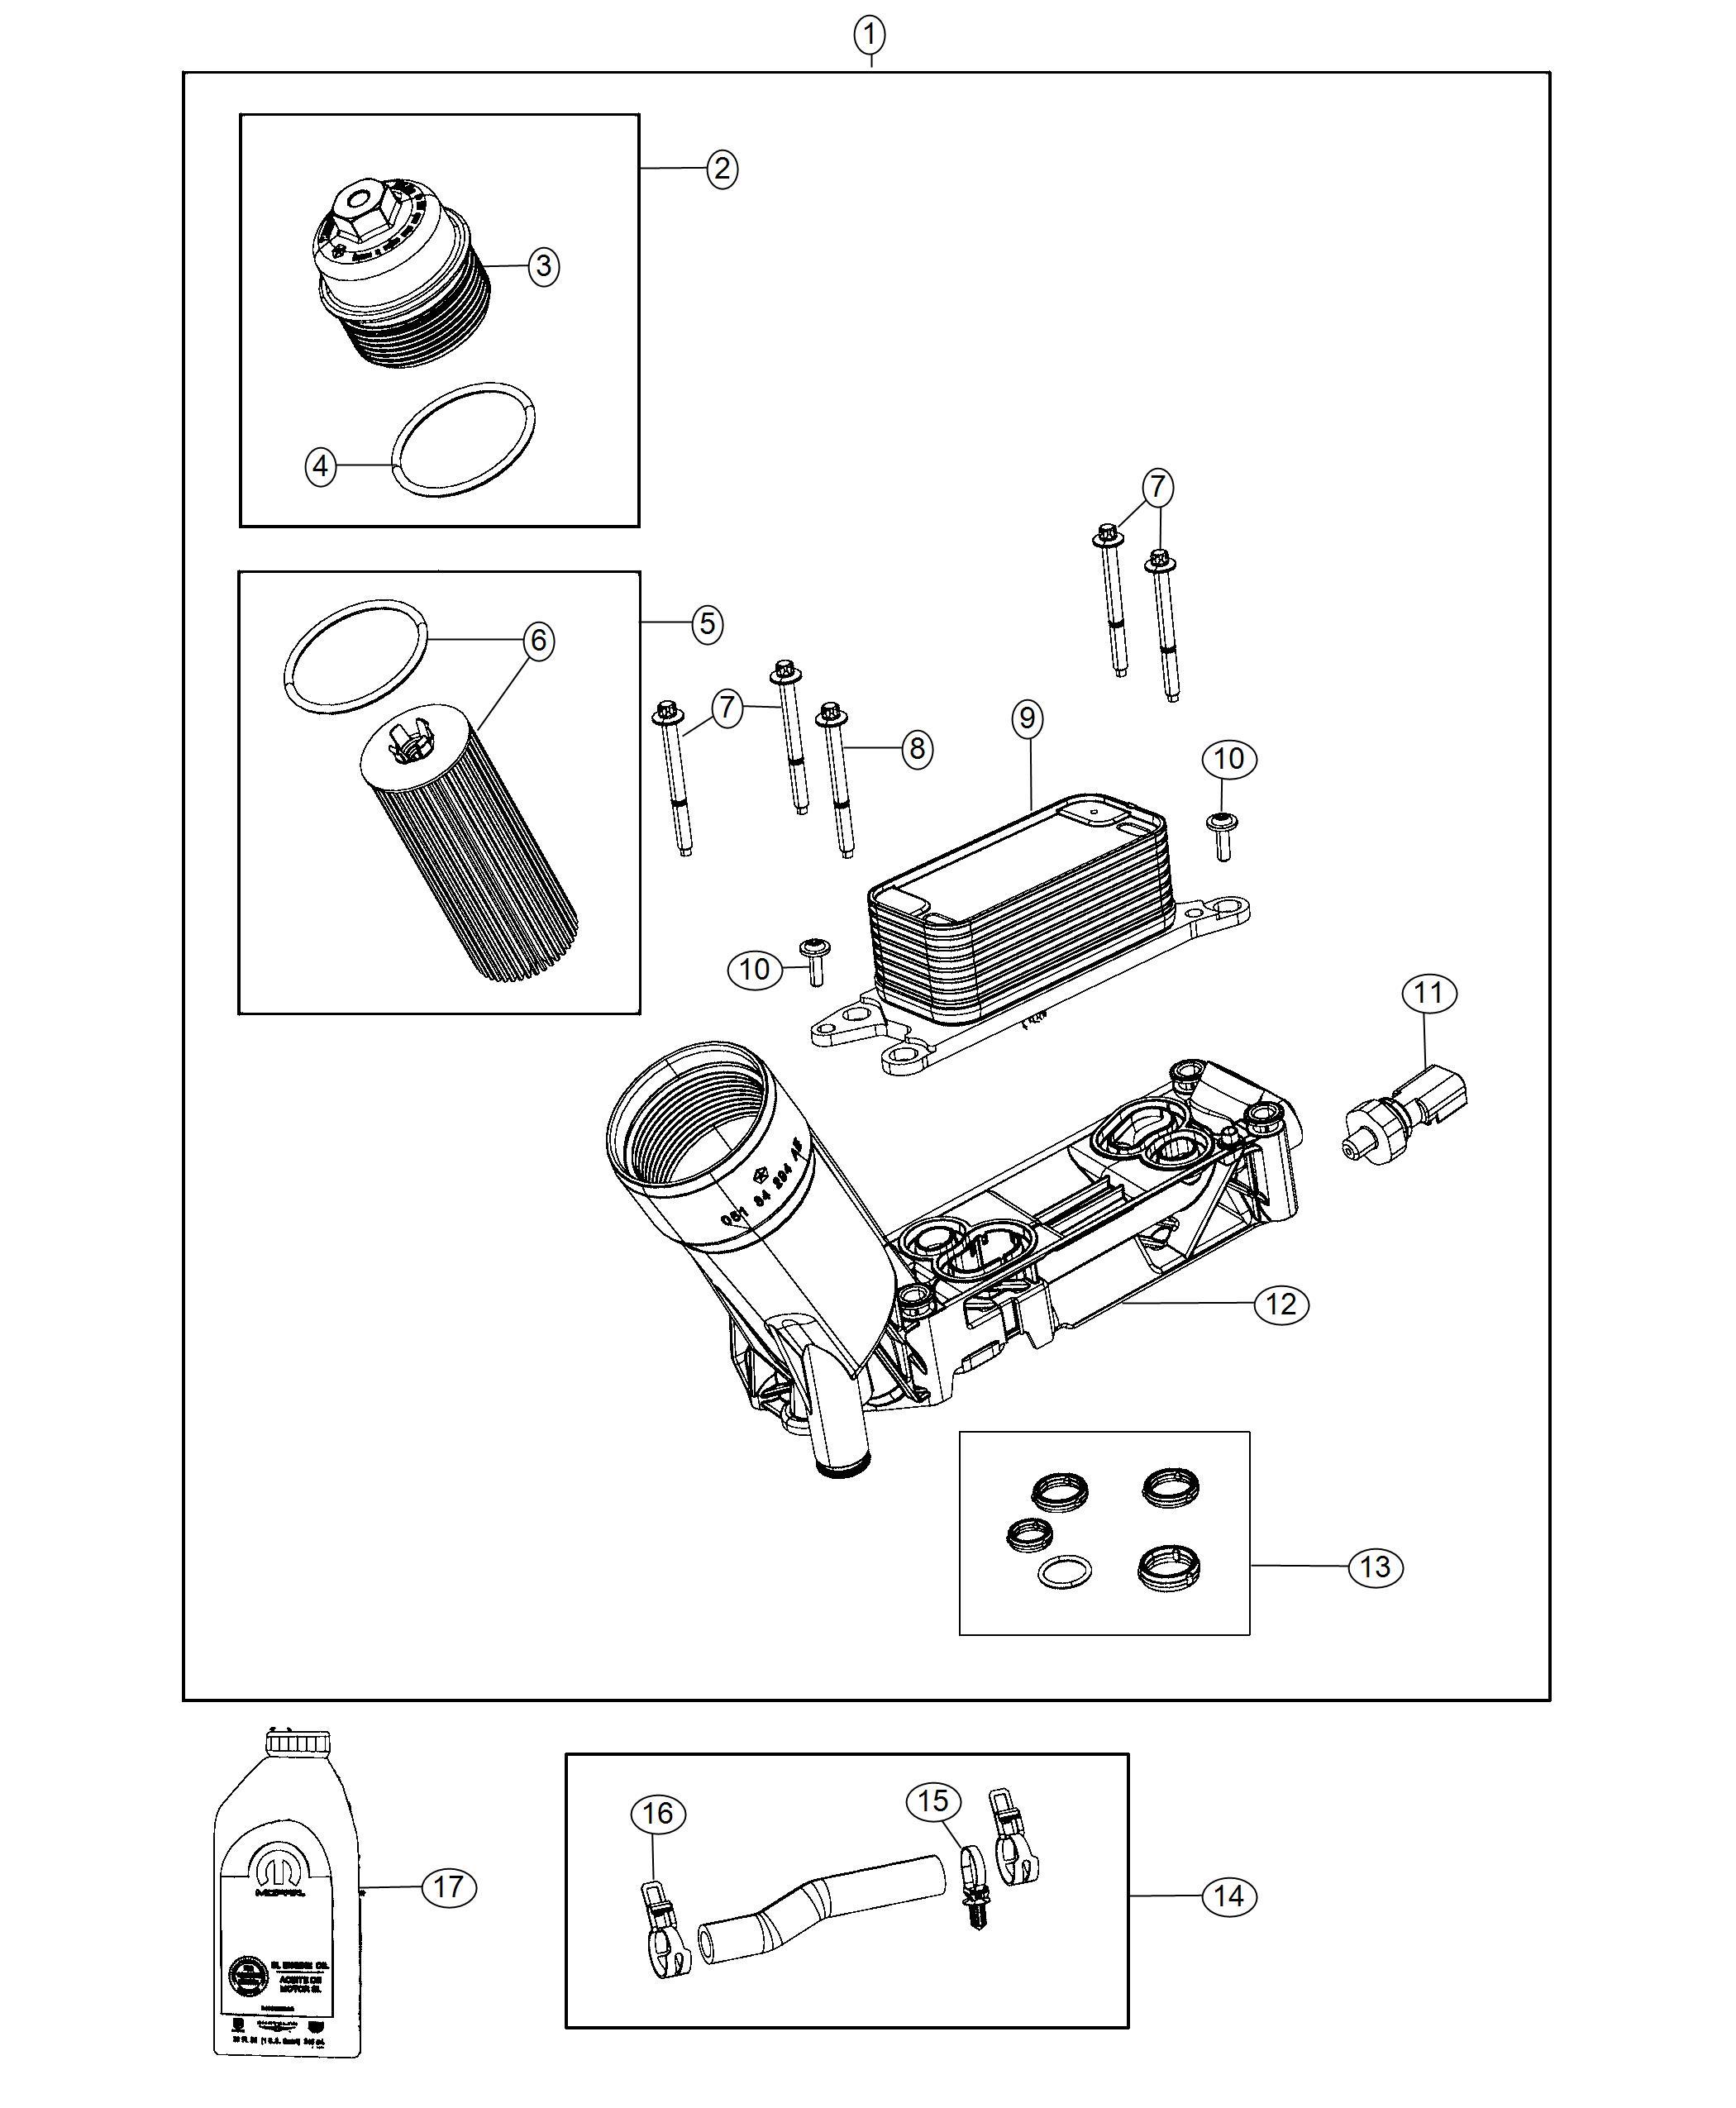 Jeep Wrangler Engine oil. 0w20. Quart. Adapter, filter